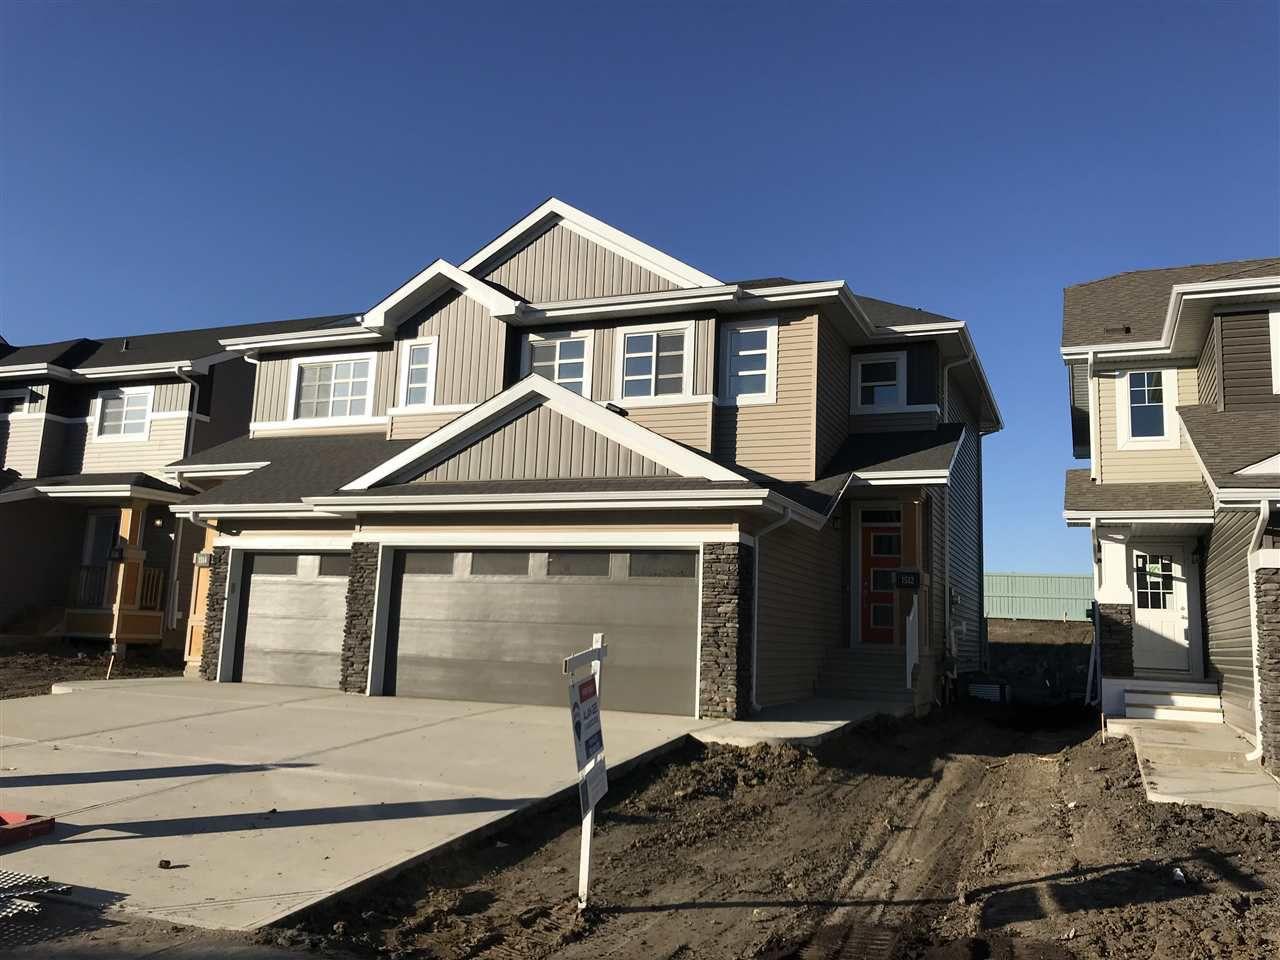 Main Photo: 1512 169 Street in Edmonton: Zone 56 House Half Duplex for sale : MLS®# E4137361